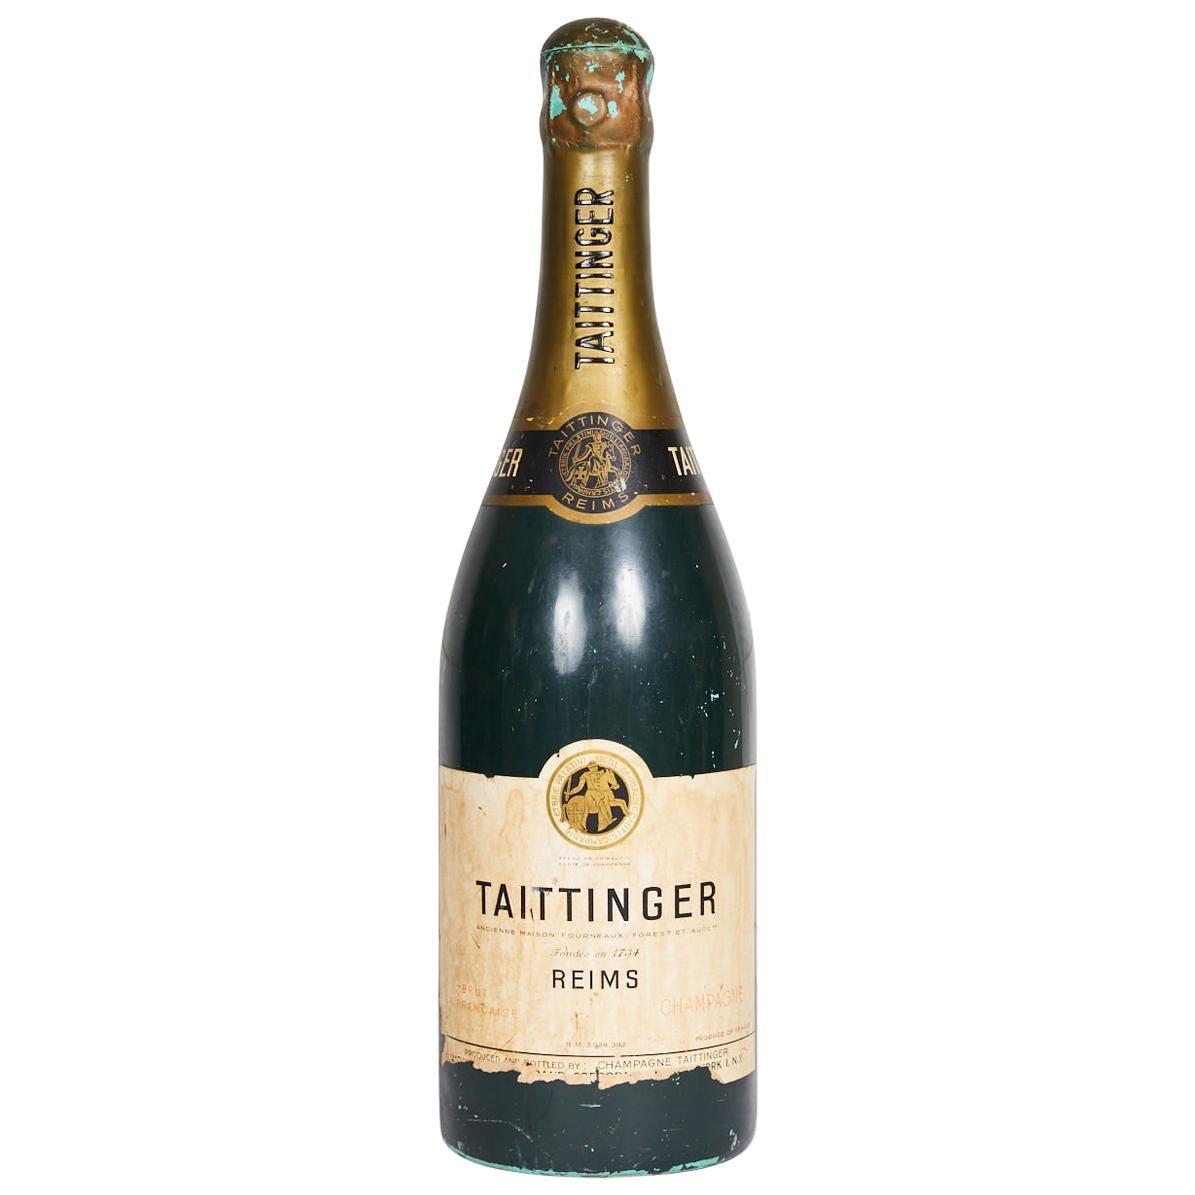 Large Vintage French Taittinger Bottle Prop